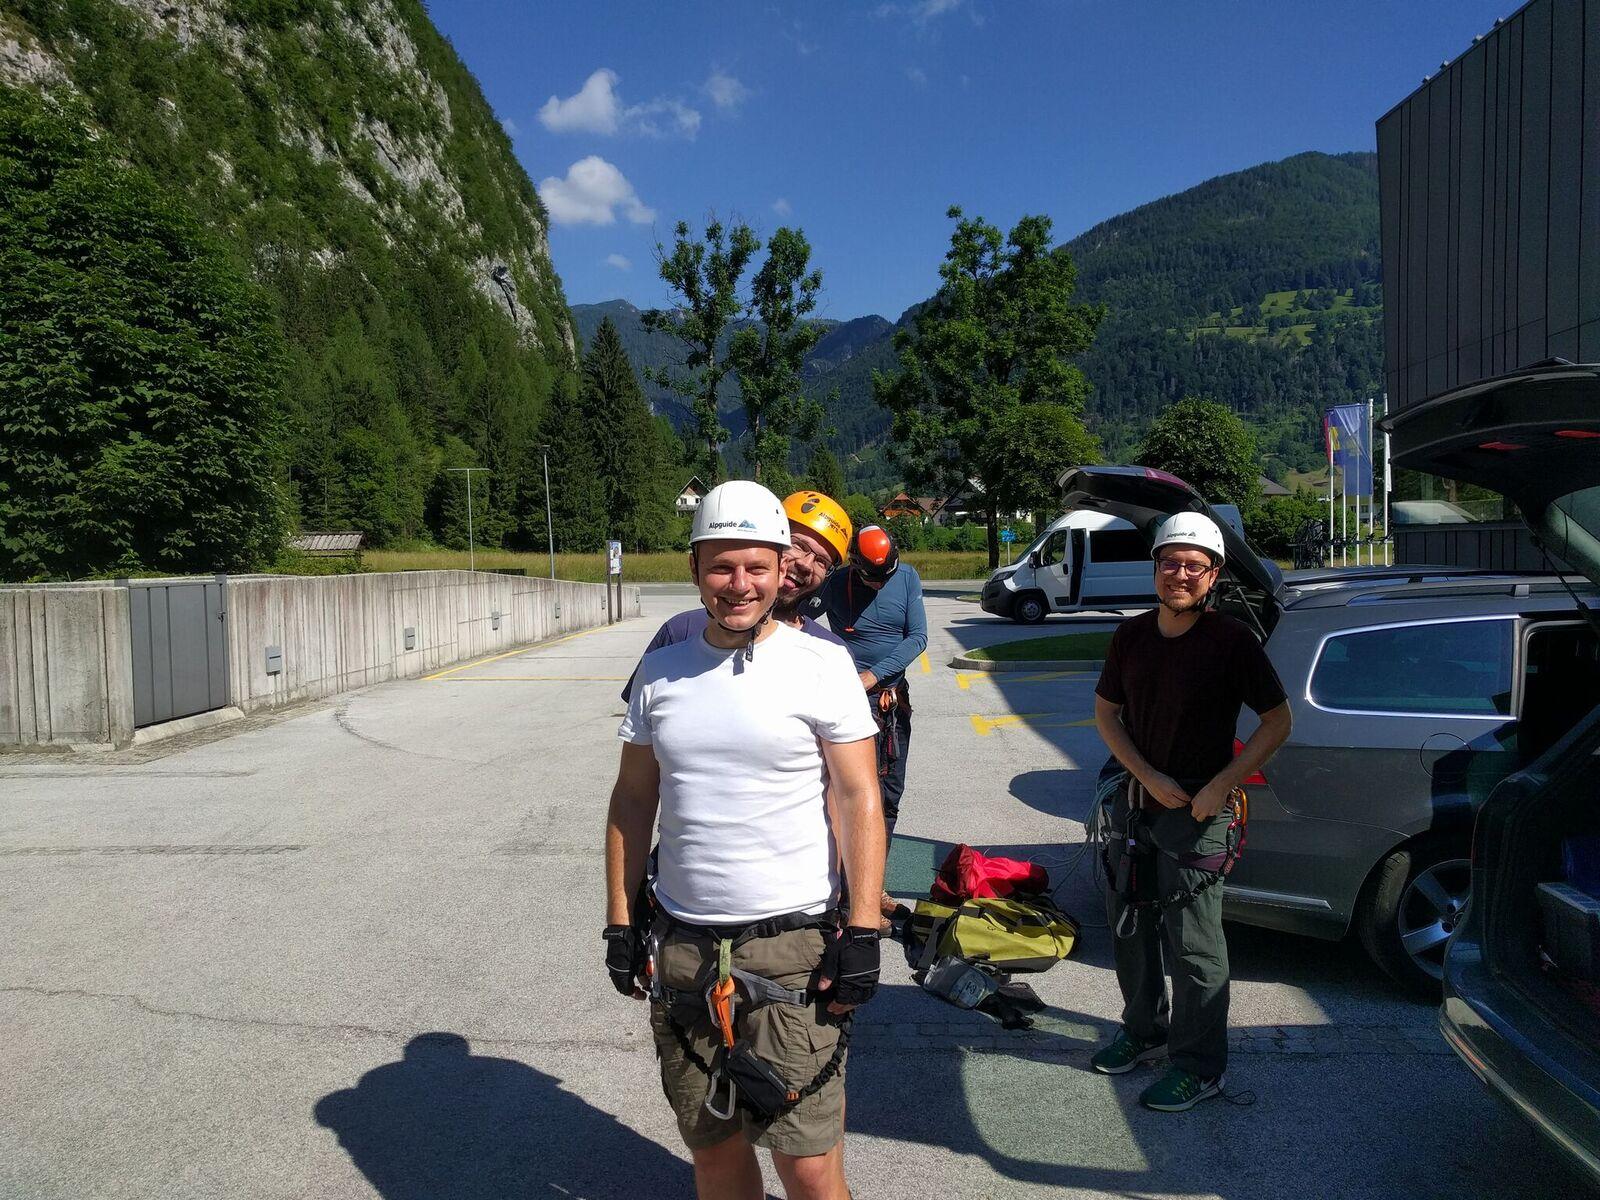 Our team wearing climbing equipment